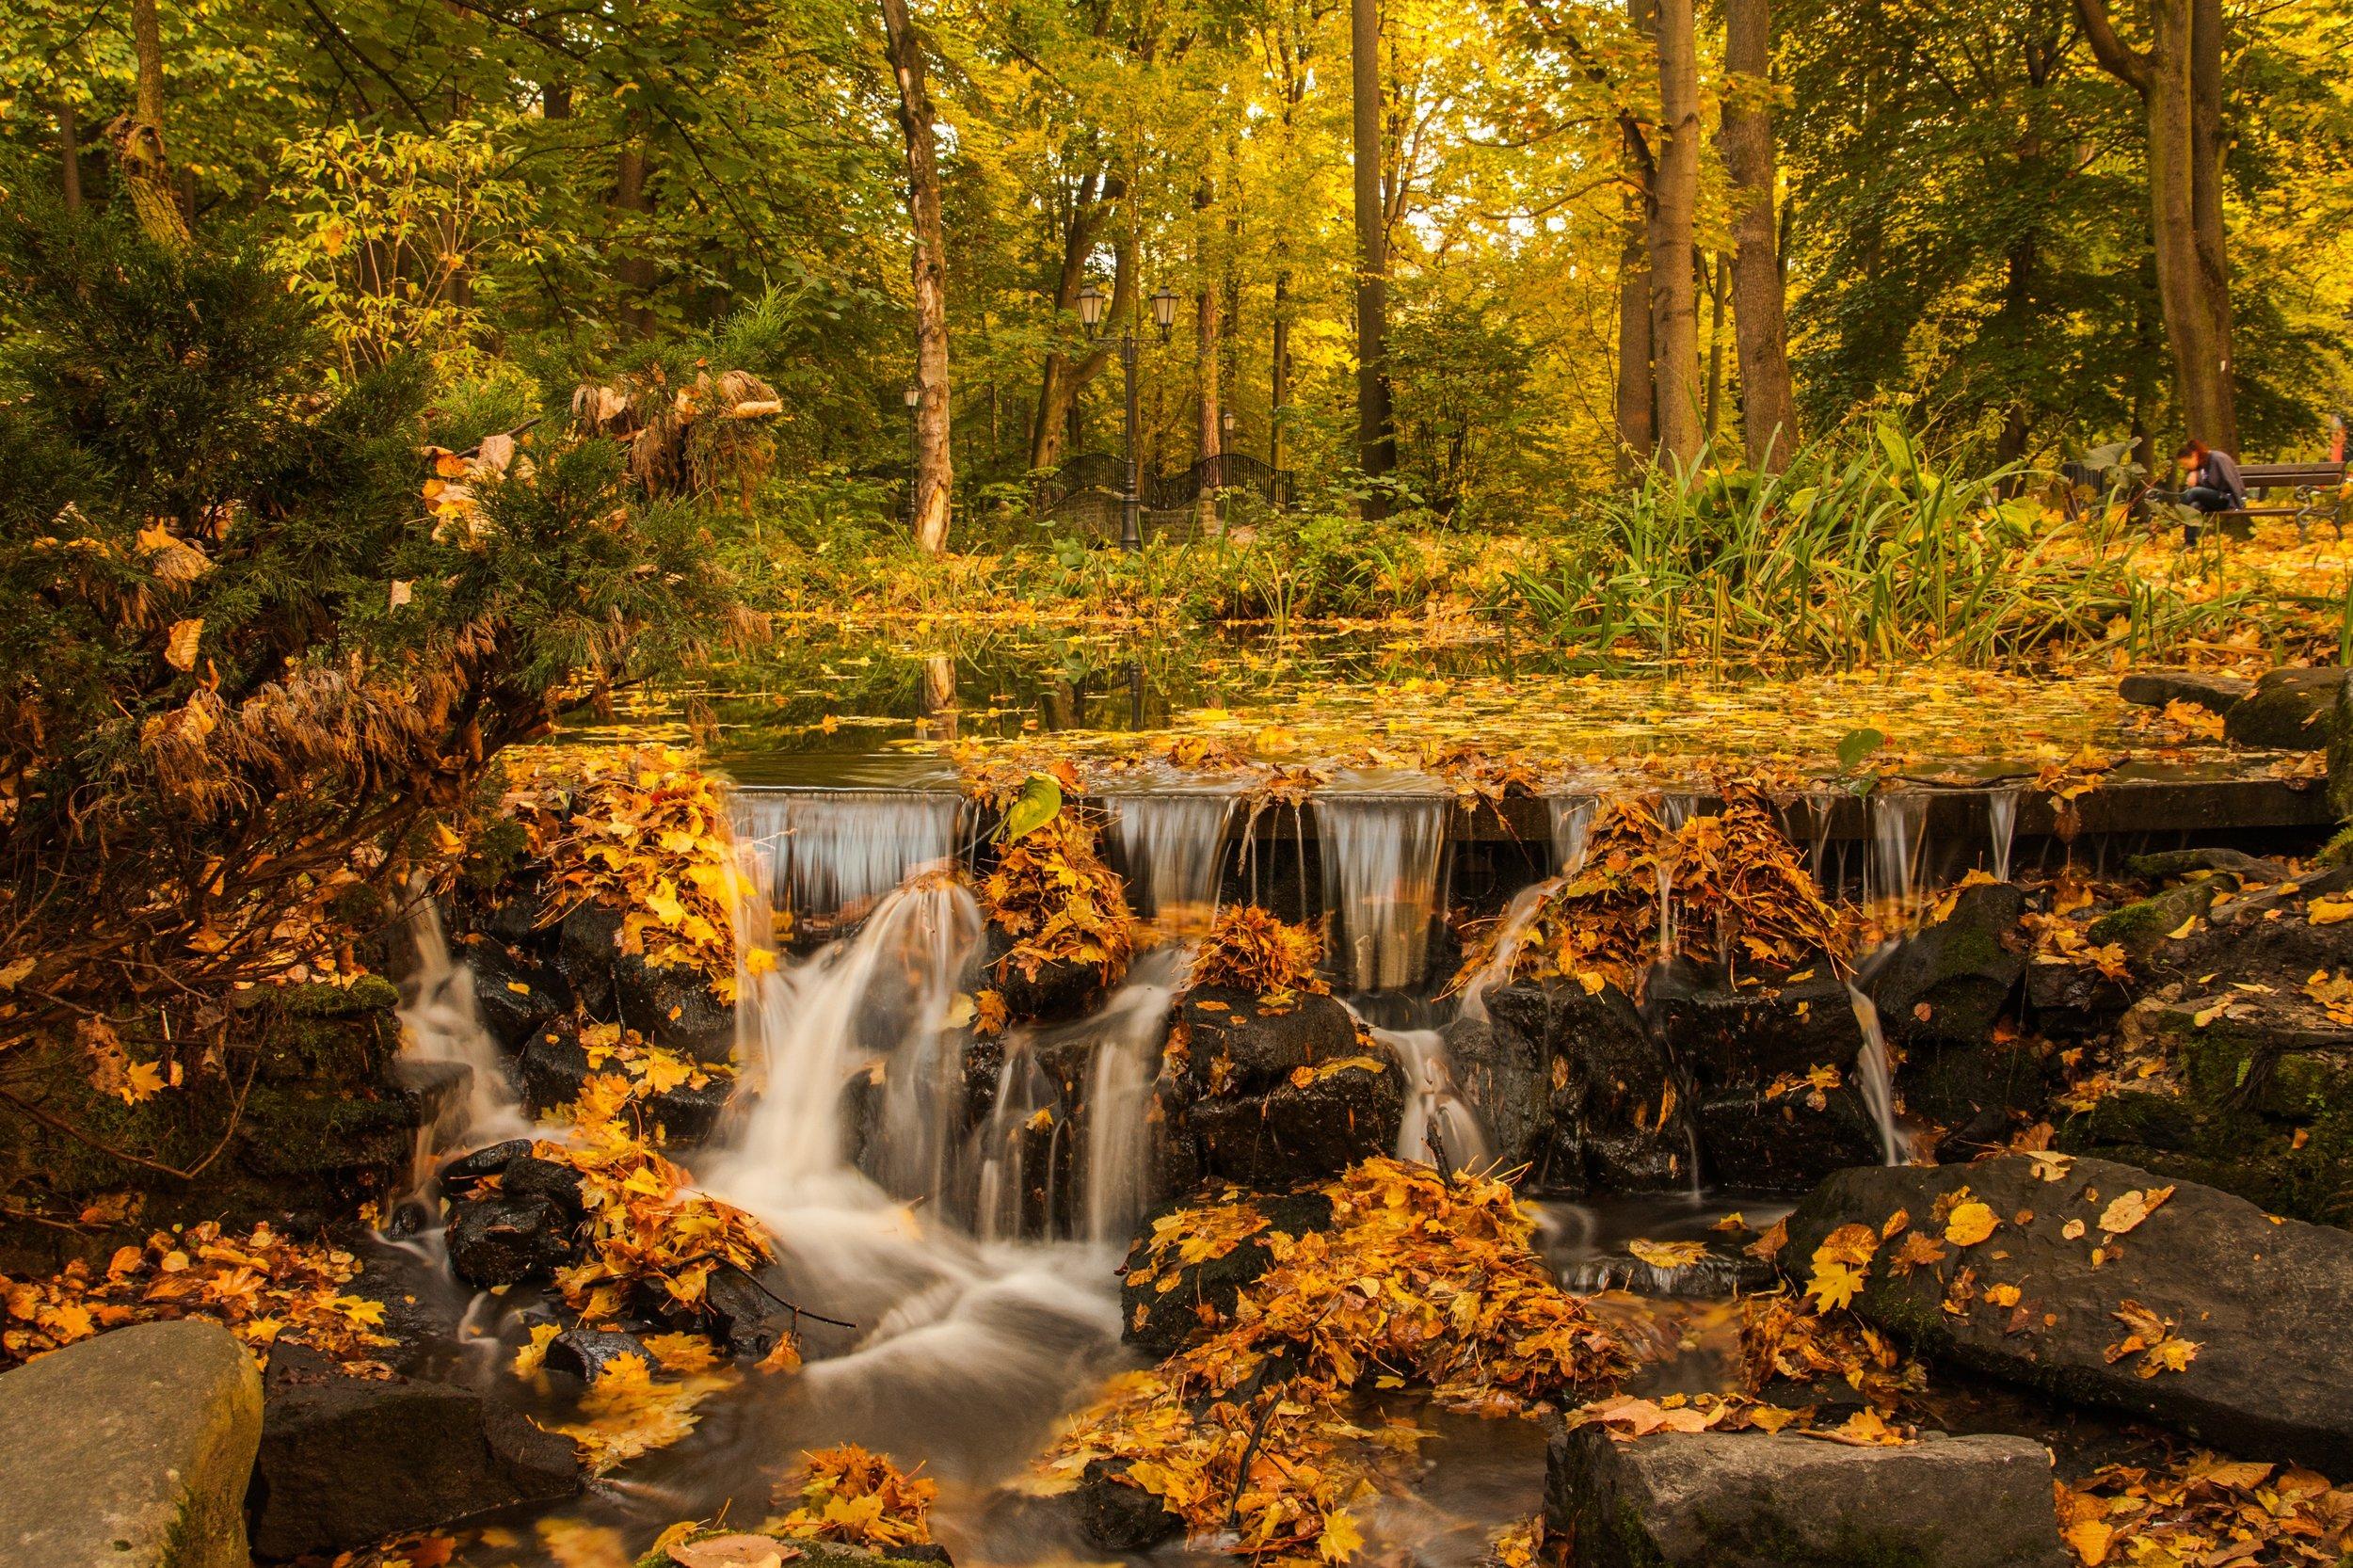 Fall forest sunset  Photo credit:  Dawid Zawiła  via Unsplash